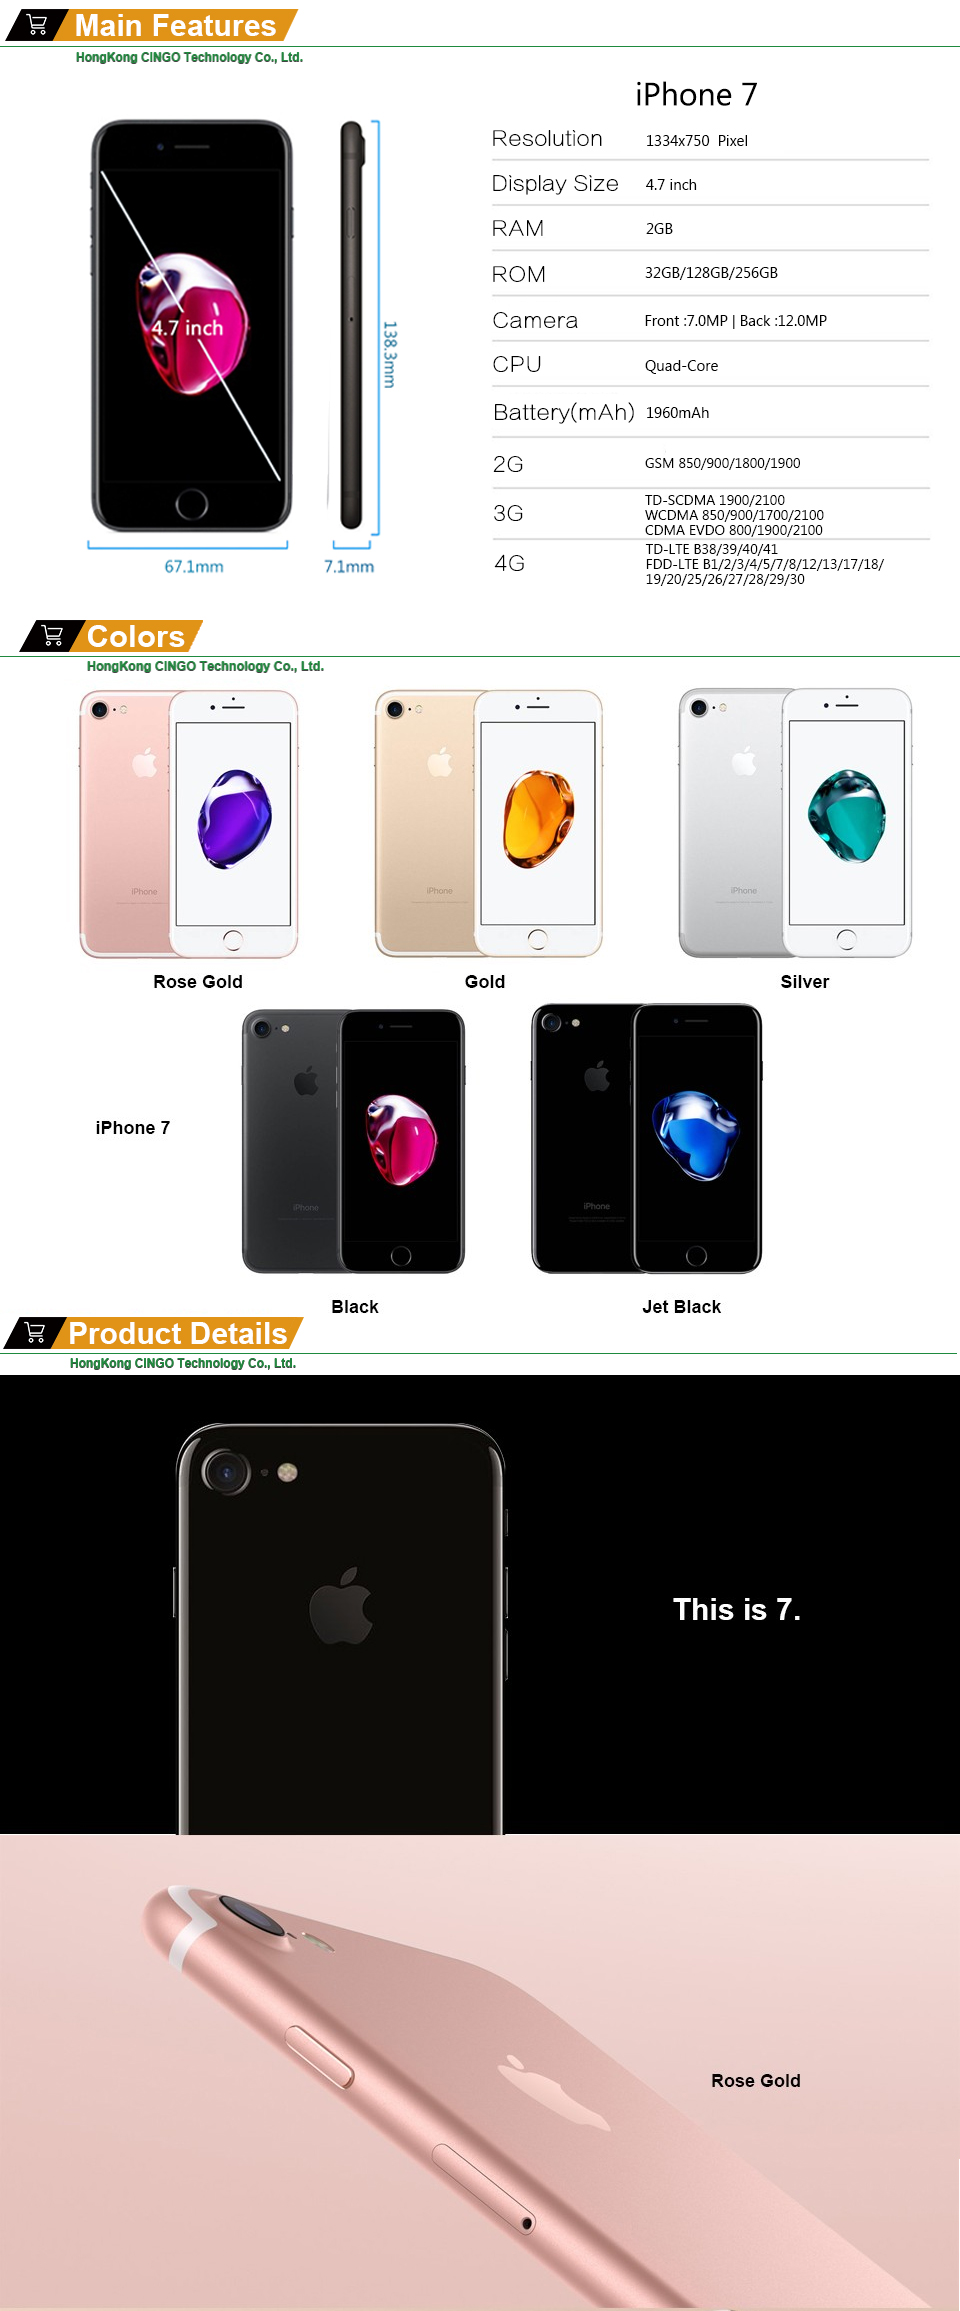 HTB1P5wKN7zoK1RjSZFlq6yi4VXaB Unlocked Apple iPhone 7 4G LTE Cell Phone 32/128GB/256GB IOS 12.0MP Camera Quad-Core Fingerprint 12MP 1960mA